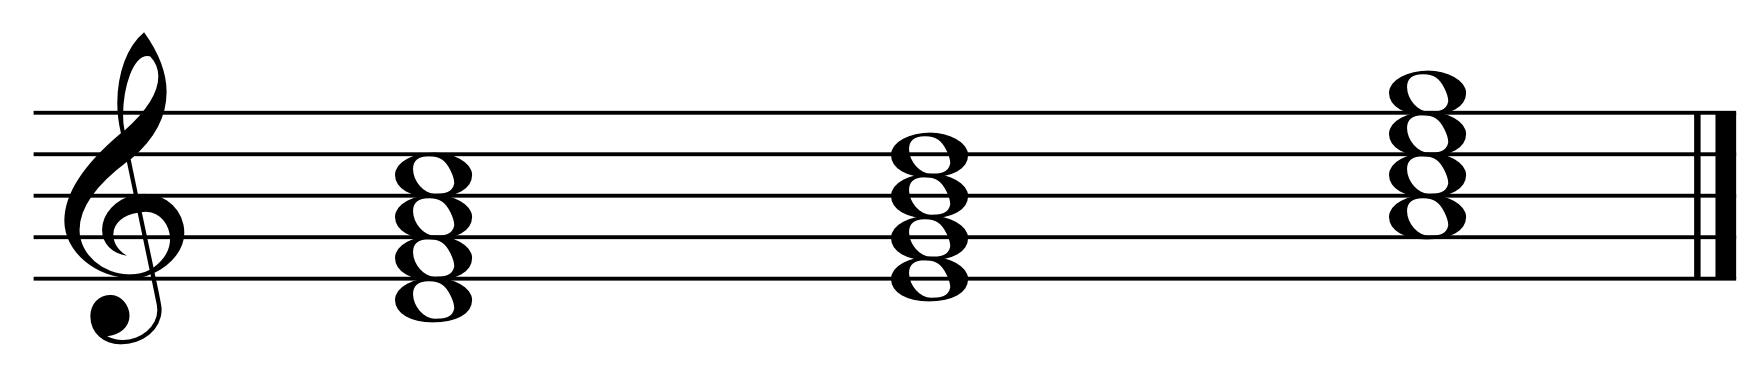 Triads and Seventh Chords | David Kulma